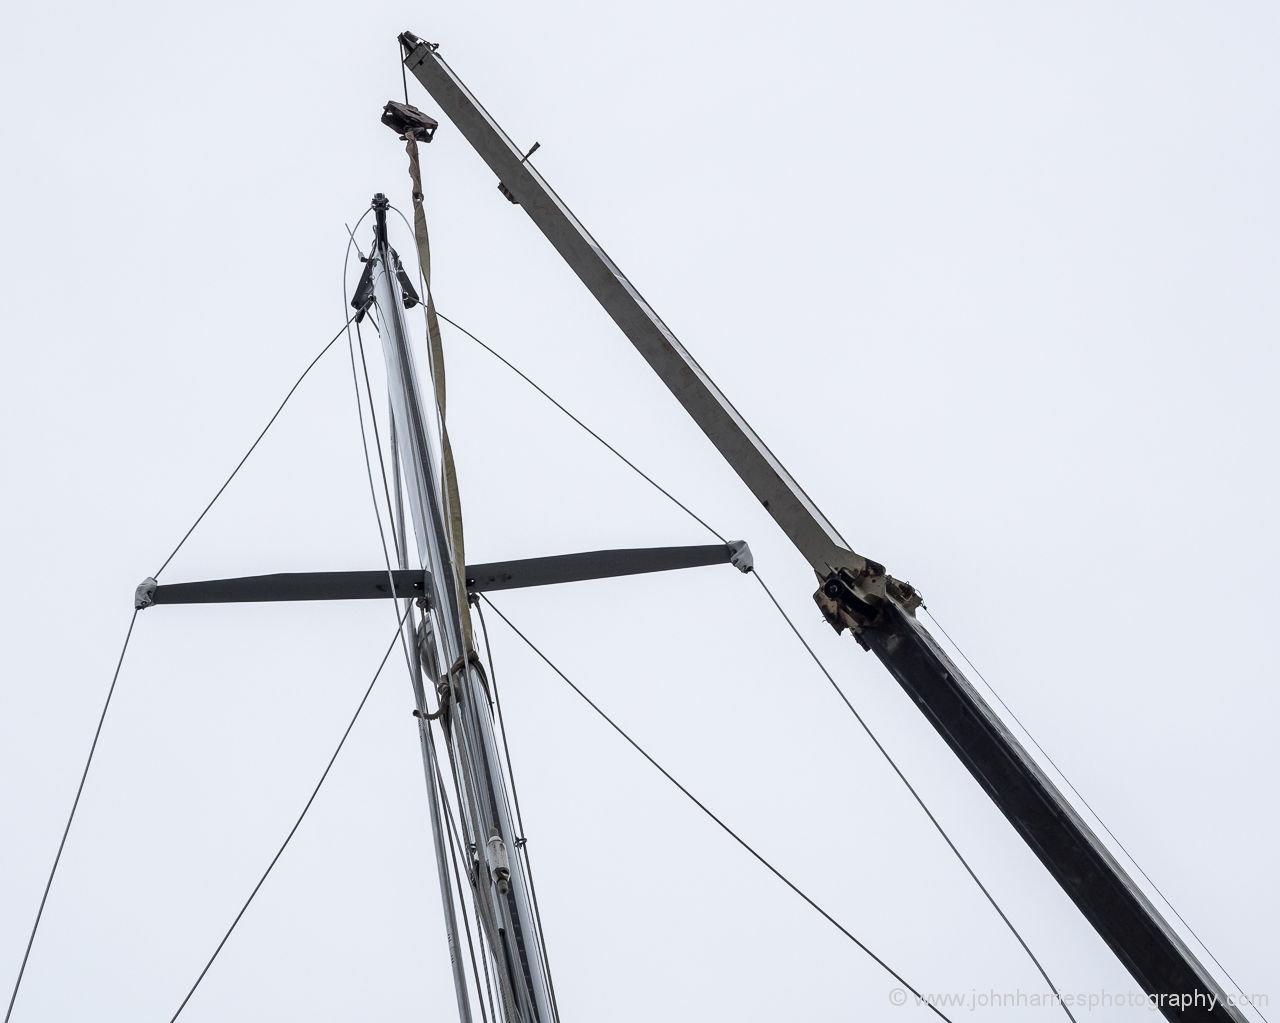 Mast Raising or Lowering